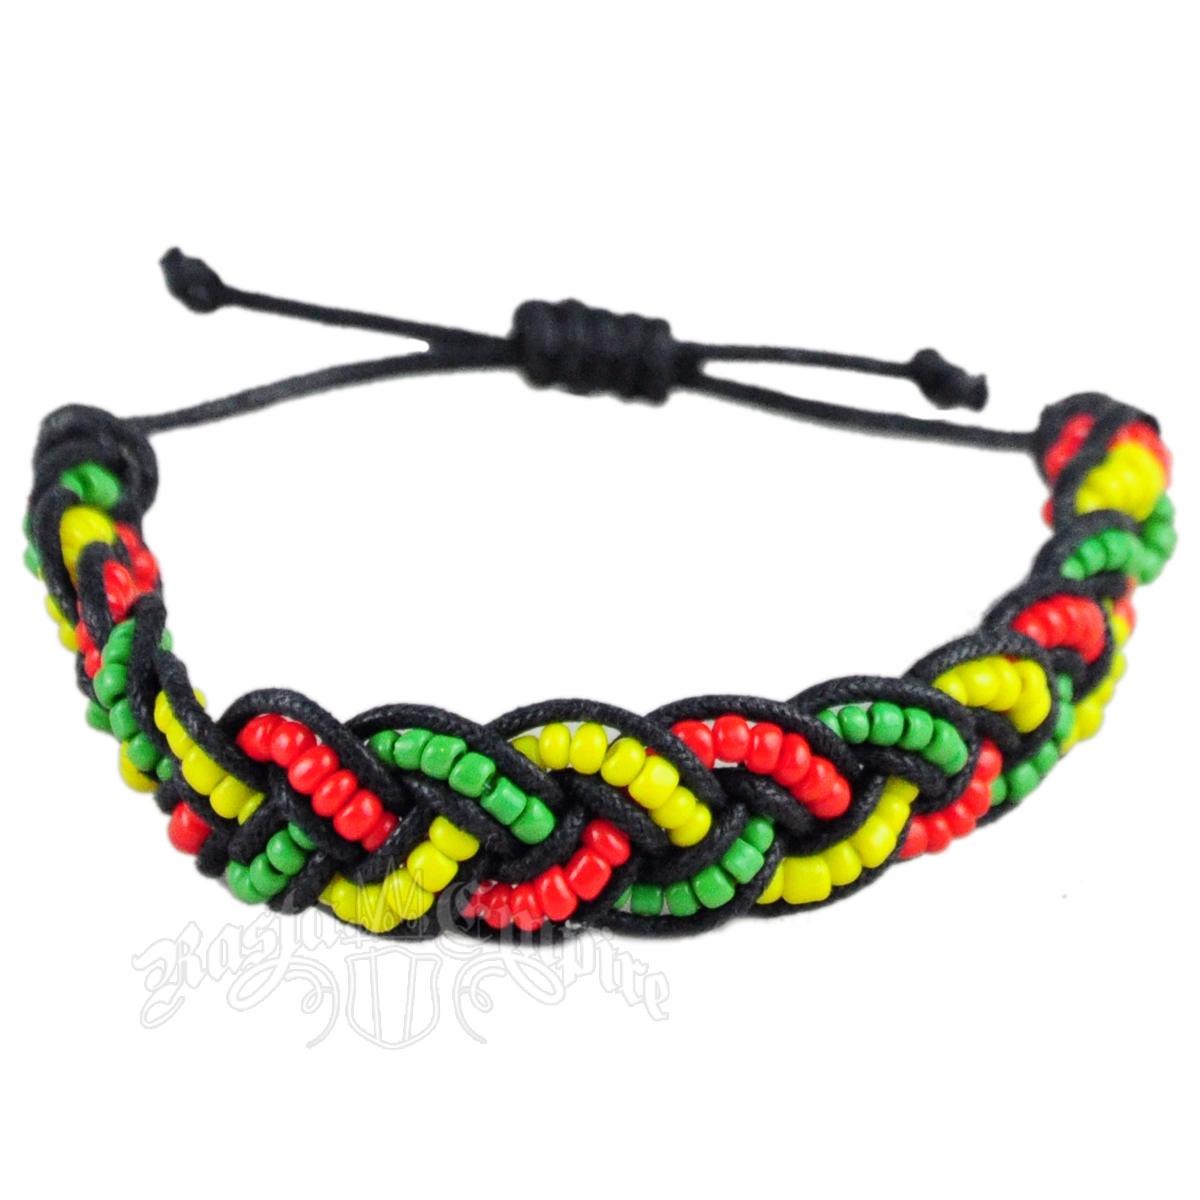 rasta braided coco bracelet rastaempire